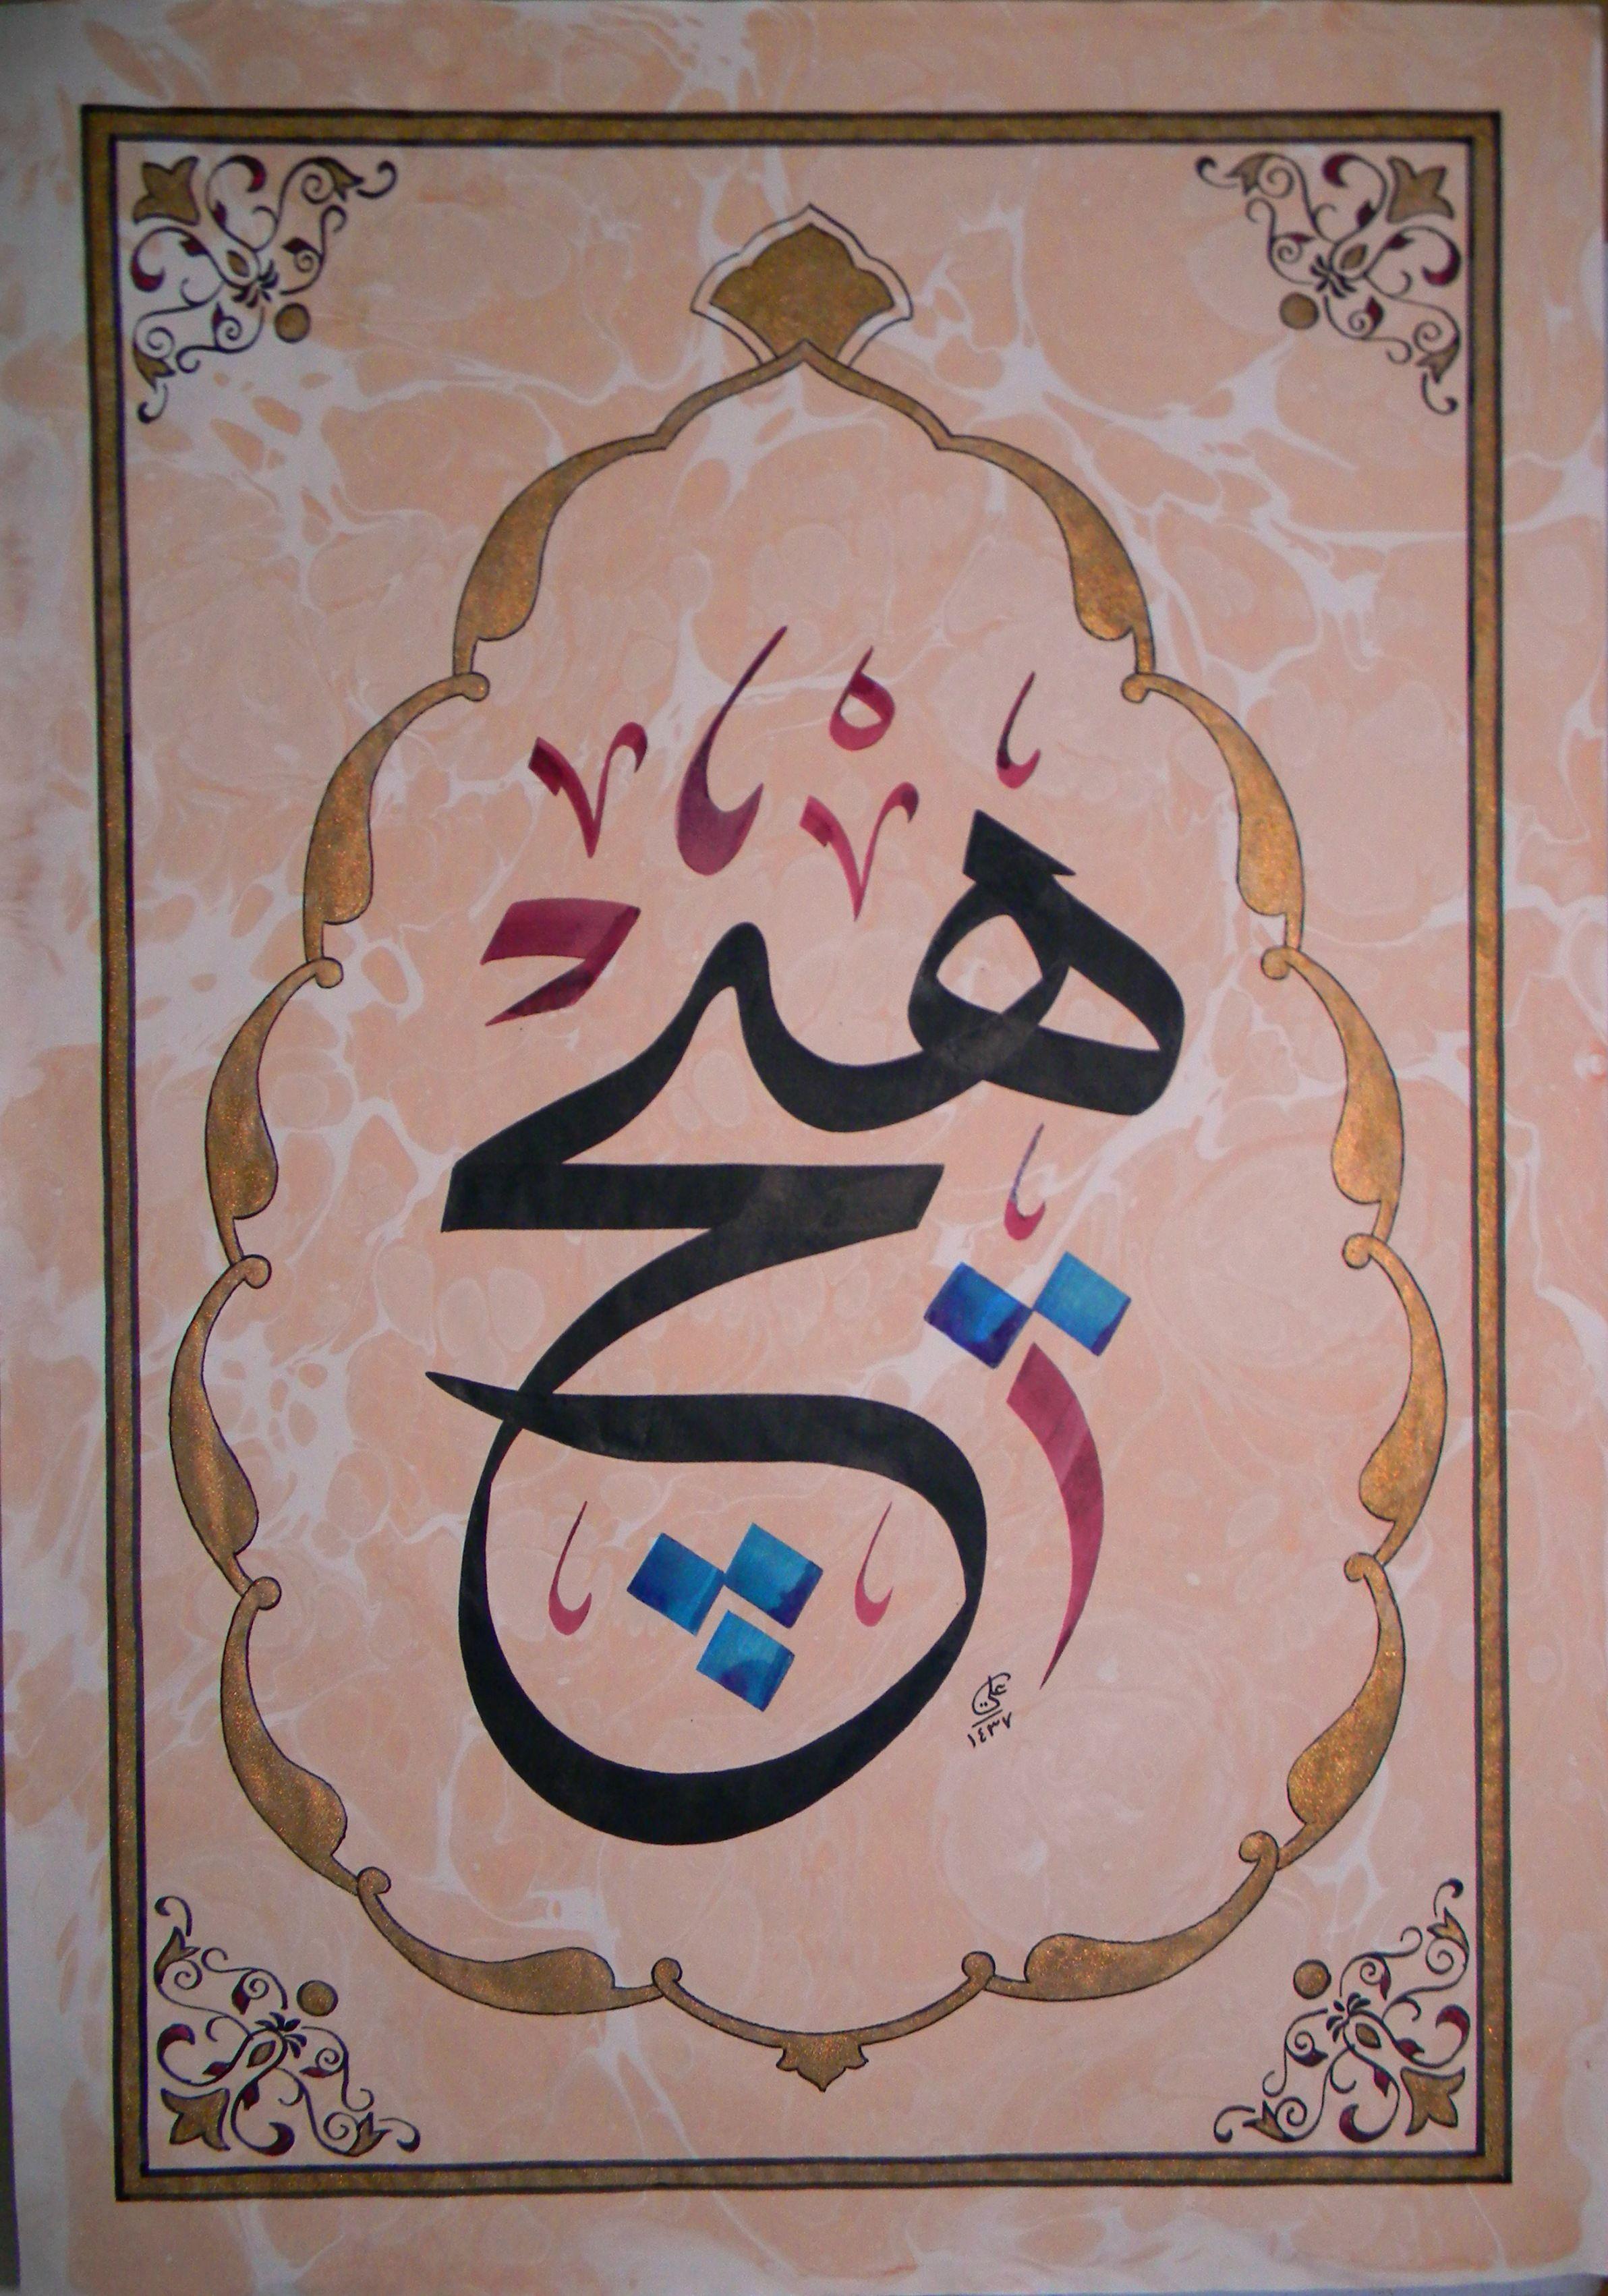 Arzu Tokay Adli Kullanicinin Hat Sanati Panosundaki Pin Islami Sanat Cizimler Tablolar